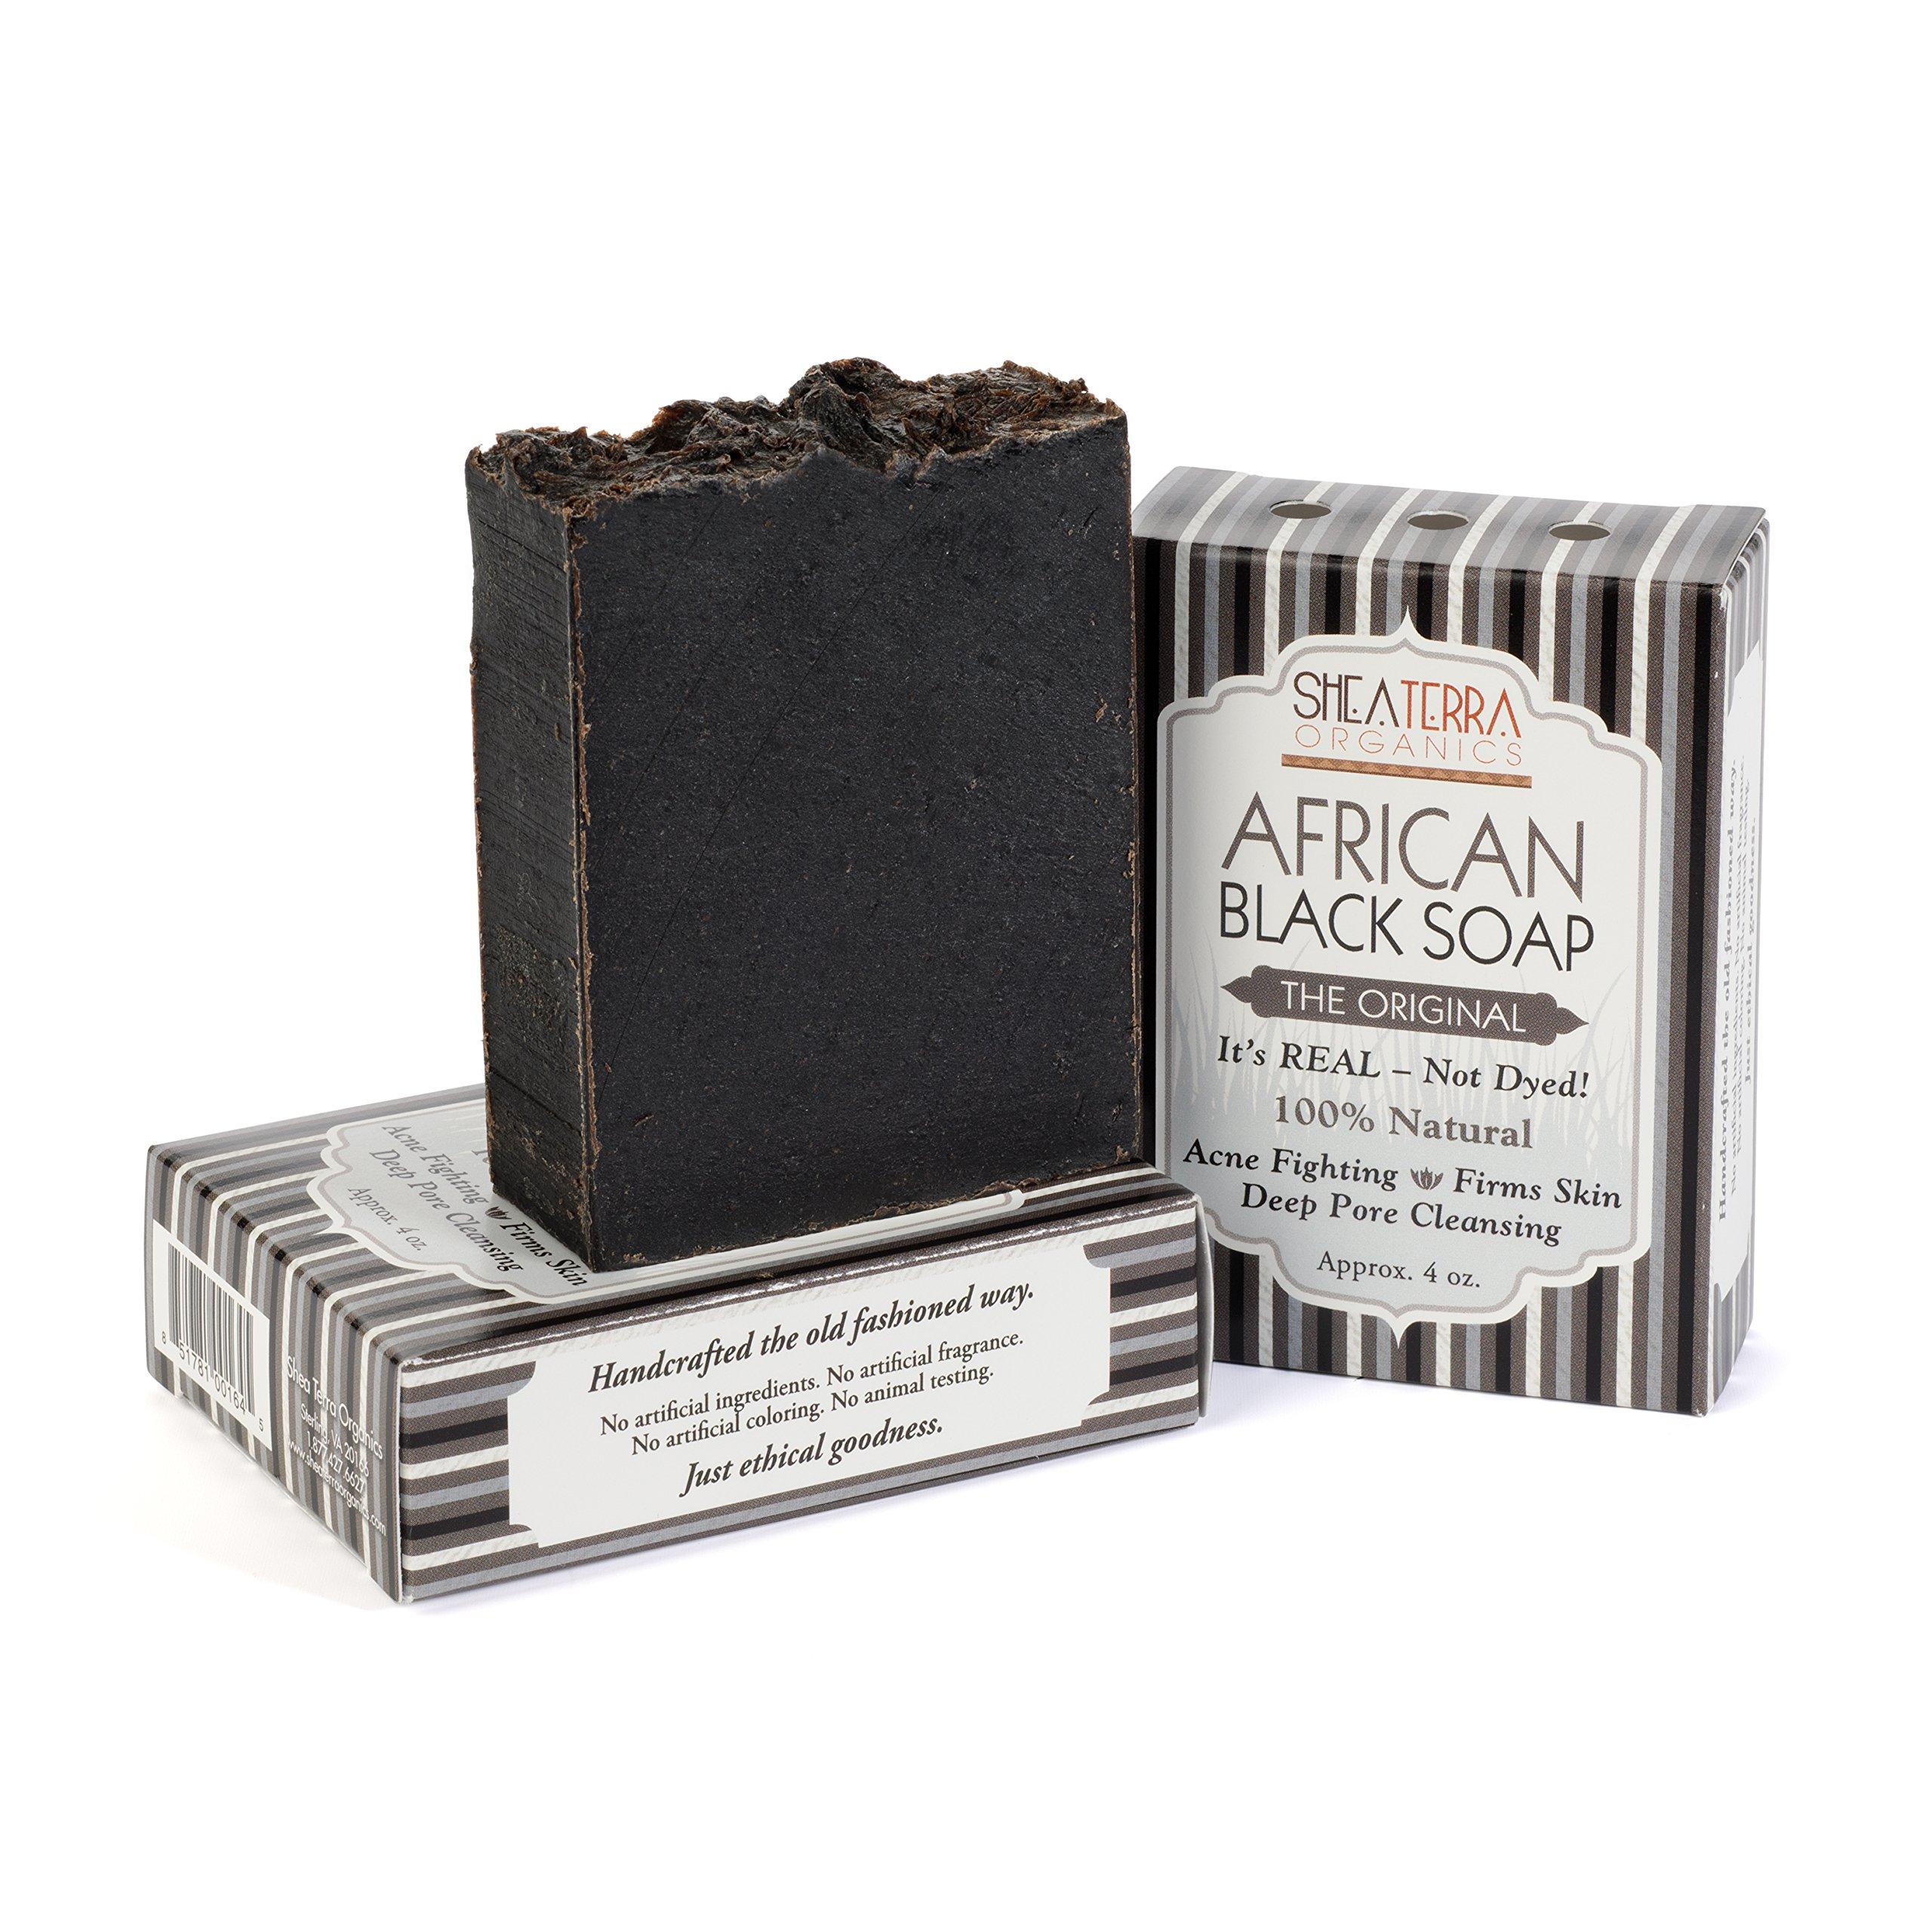 Shea Terra Organics African Black Soap Bar – The Original Yoruban Soap | Natural Skin Care for Acne, Eczema, Dry Skin, Psoriasis, Wrinkles, and More - Home Spa Treatment Full Body Wash - 4 oz